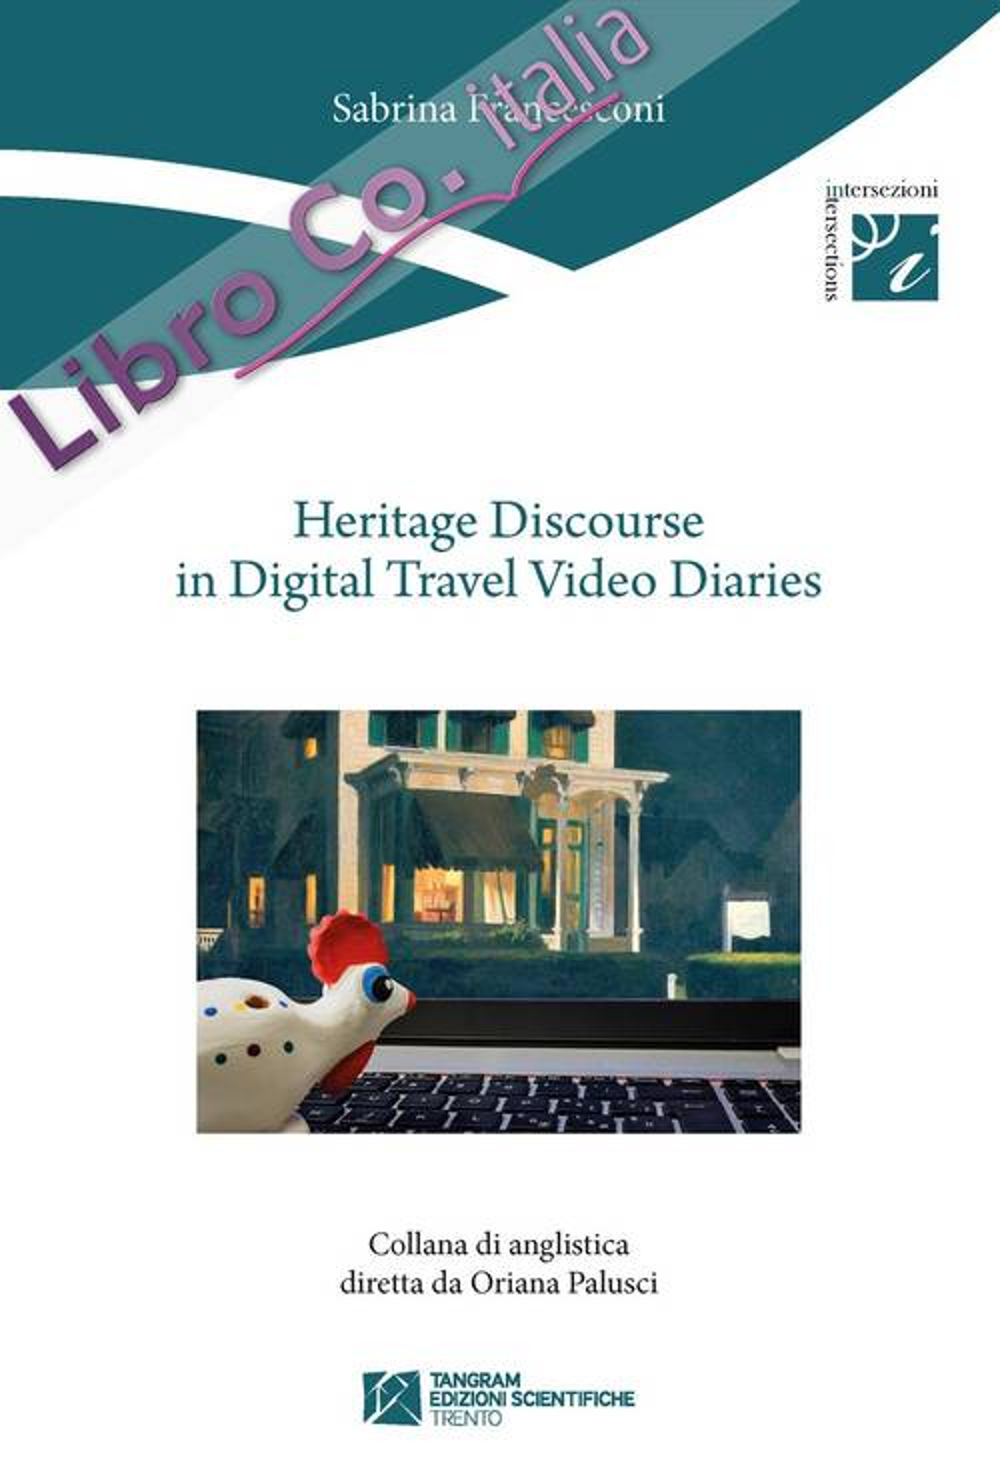 Heritage discourse in digital travel video diaries